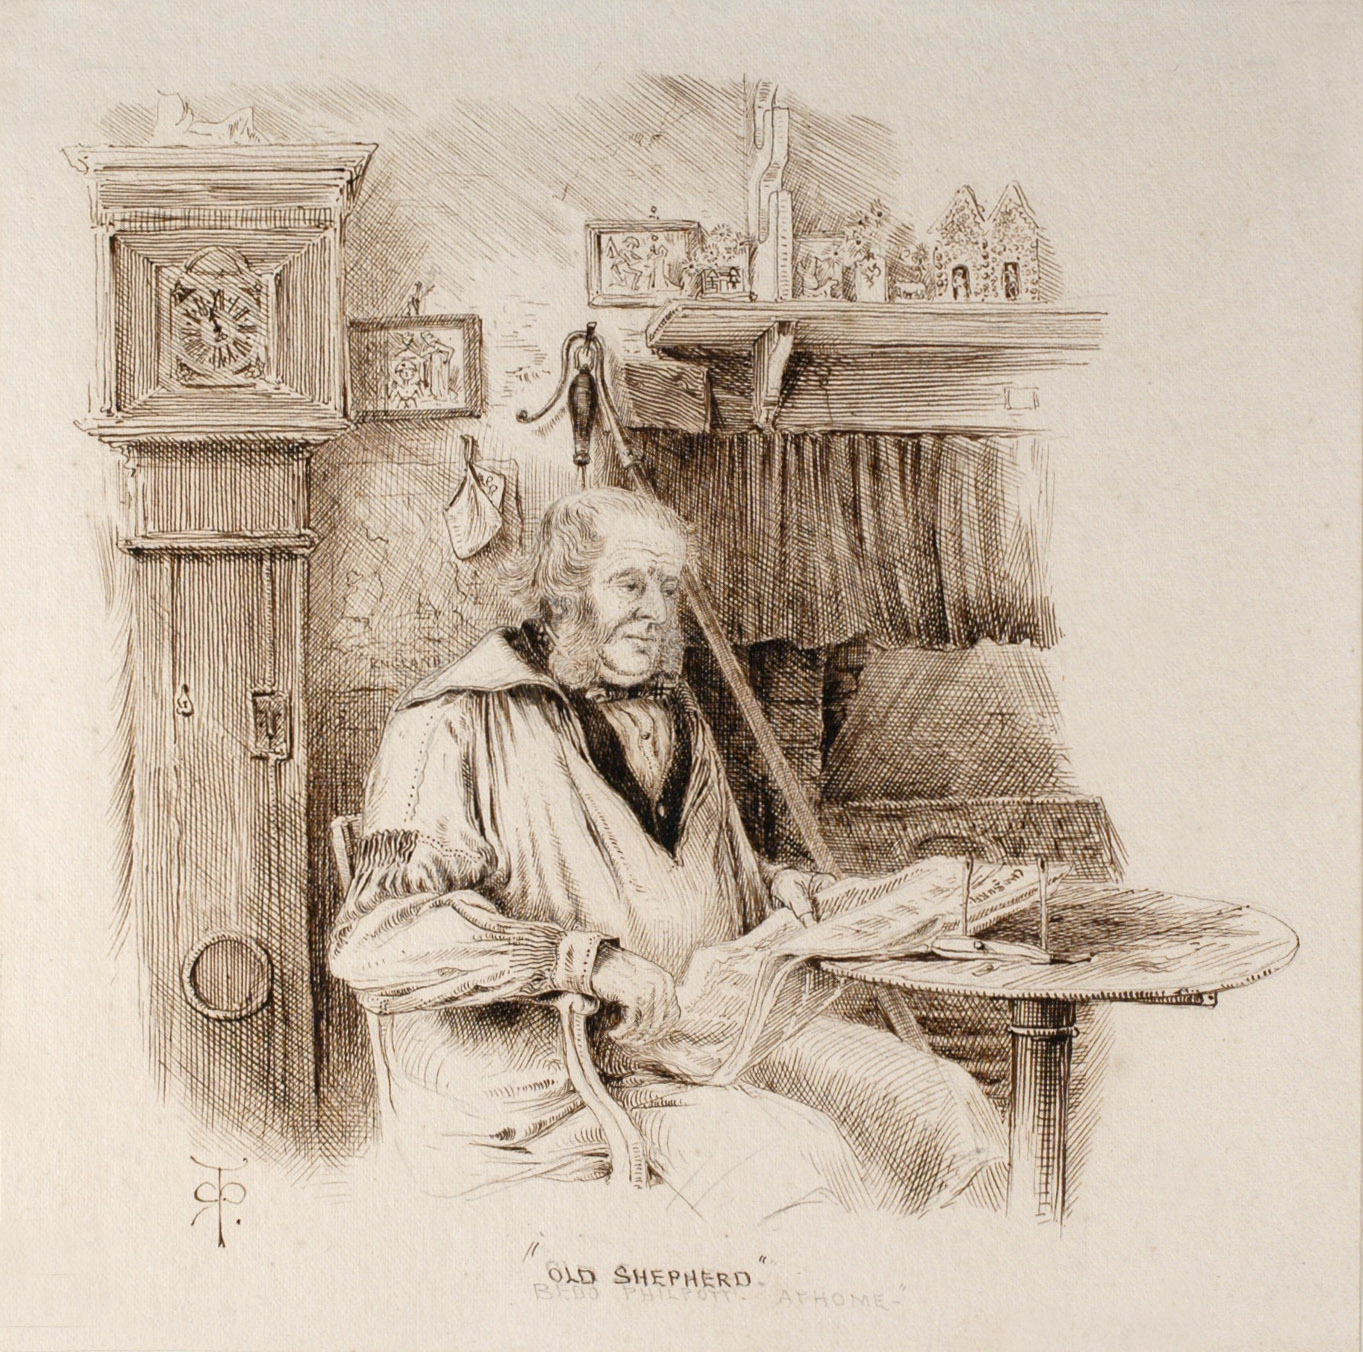 Old Shepherd by Robert Taylor Pritchett